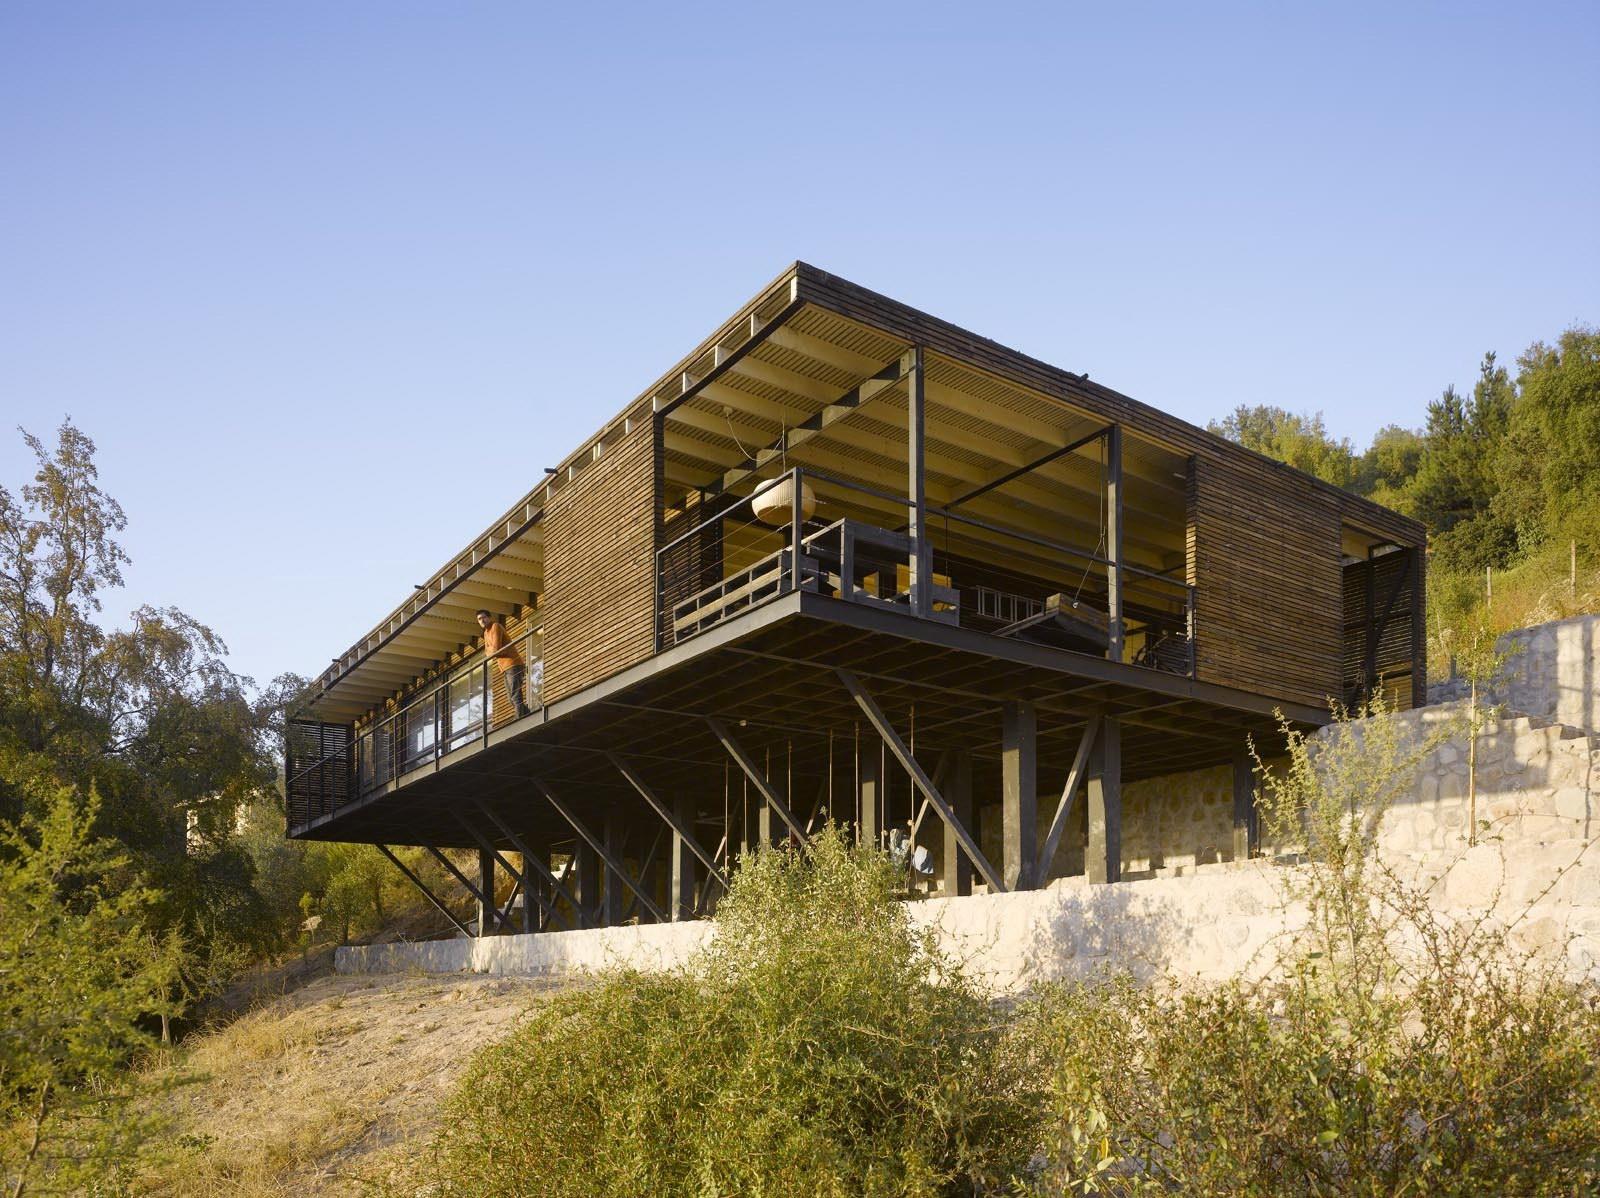 Raúl House in Chile by Mathias Klotz